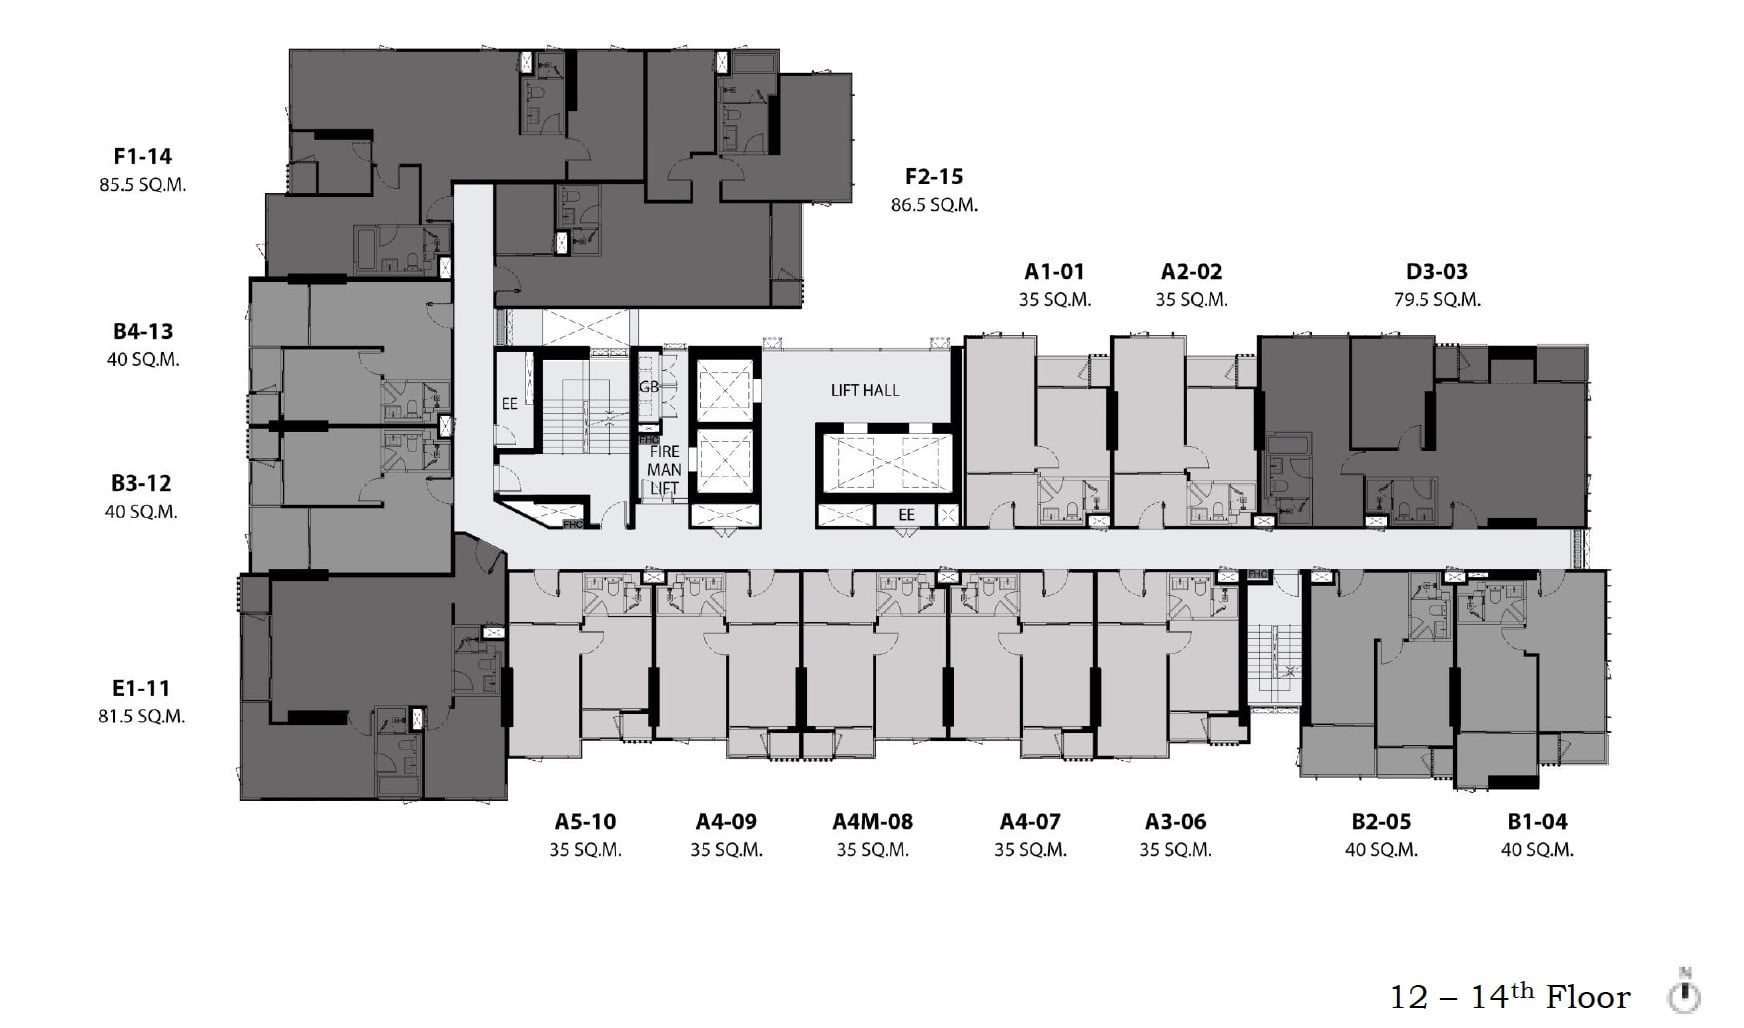 Rhythm-Ekkamai-Estate-Floor Plan 12-14th